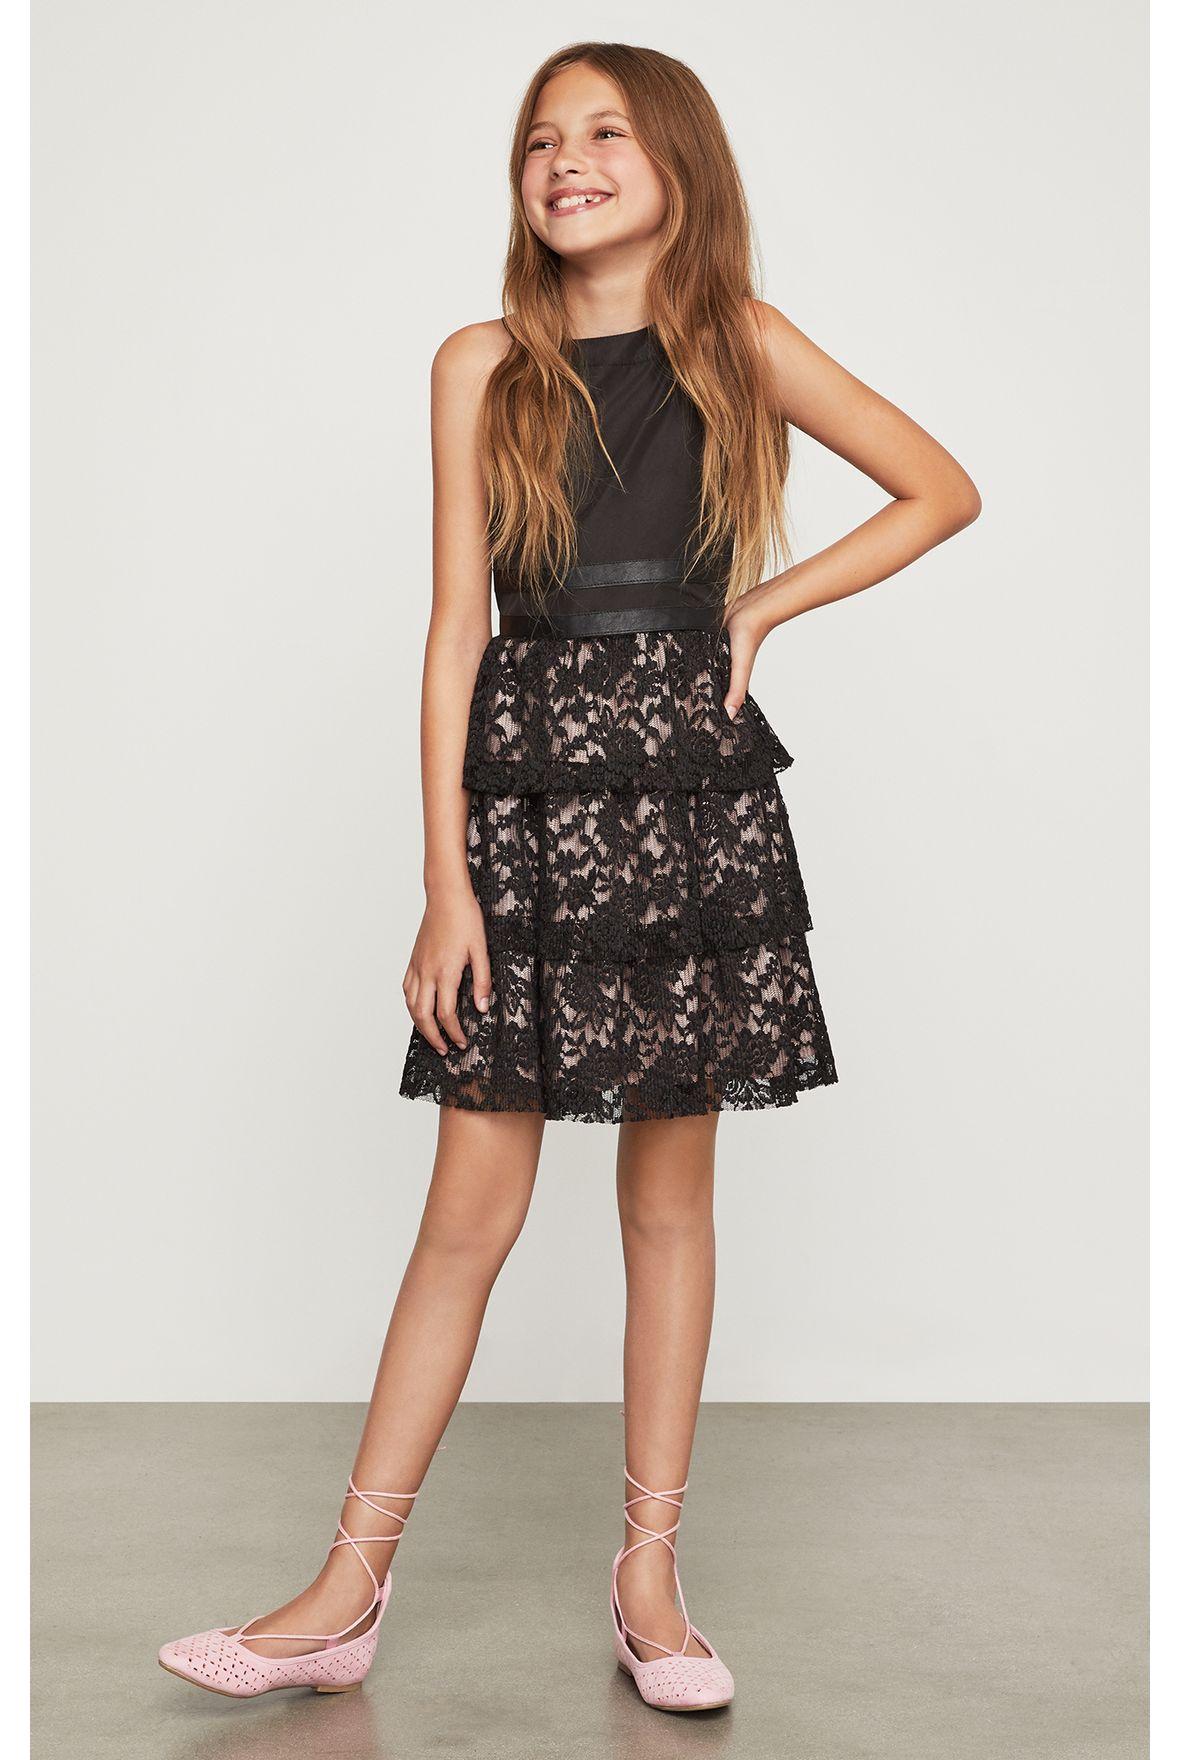 Vestido-BCBGirls-negro-con-encaje-B838DR184_BLK_b